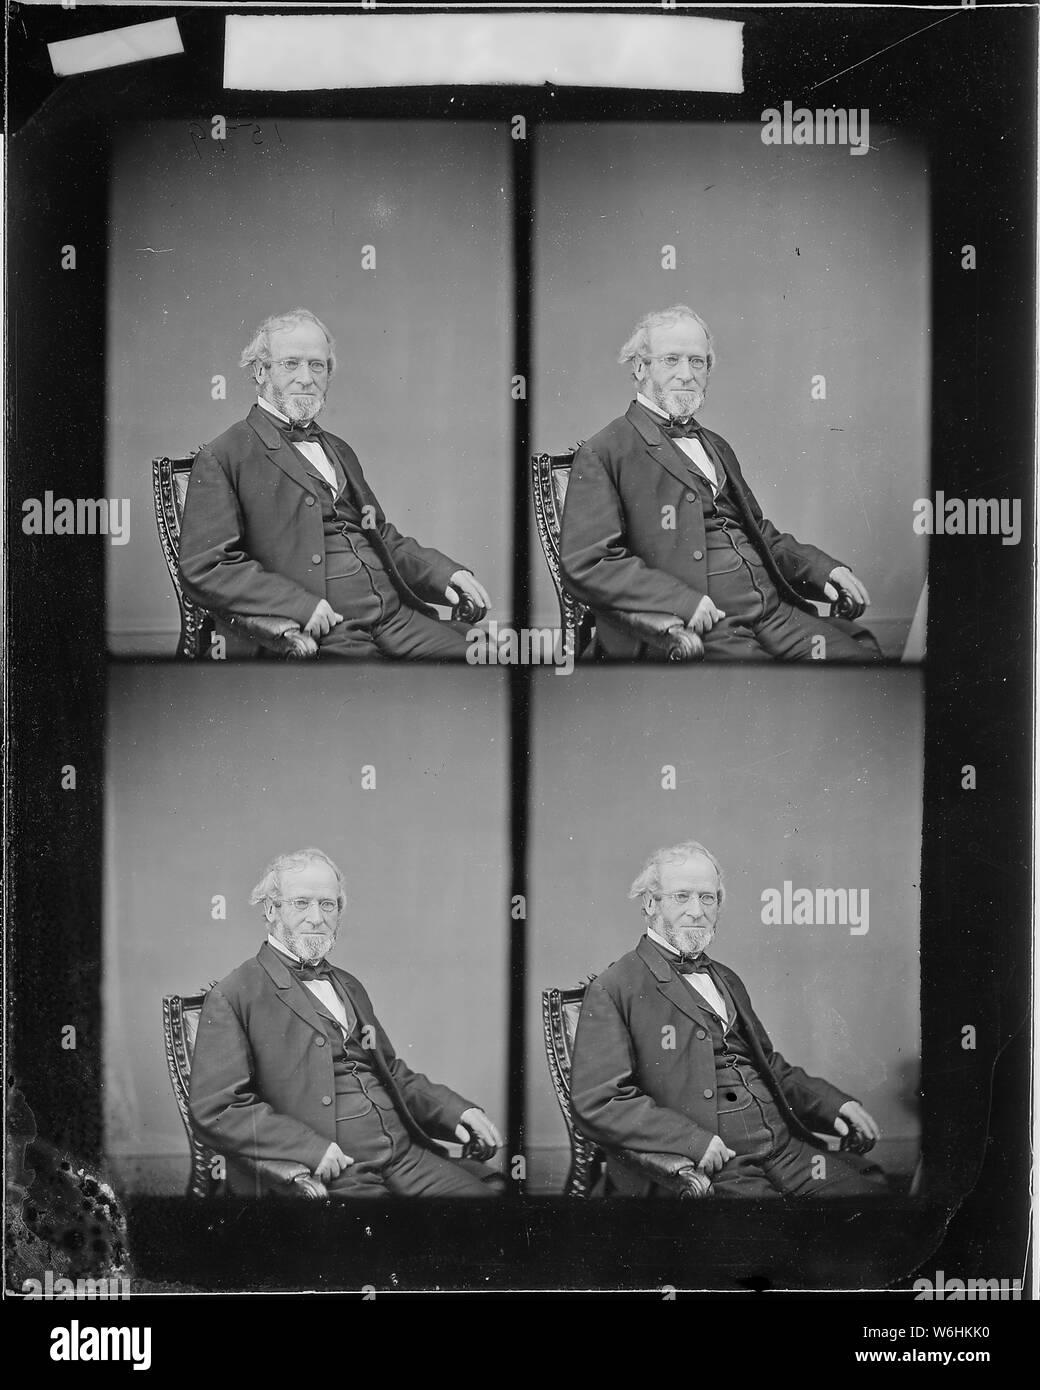 Hon. Henry S. Foote, Ala Stock Photo - Alamy